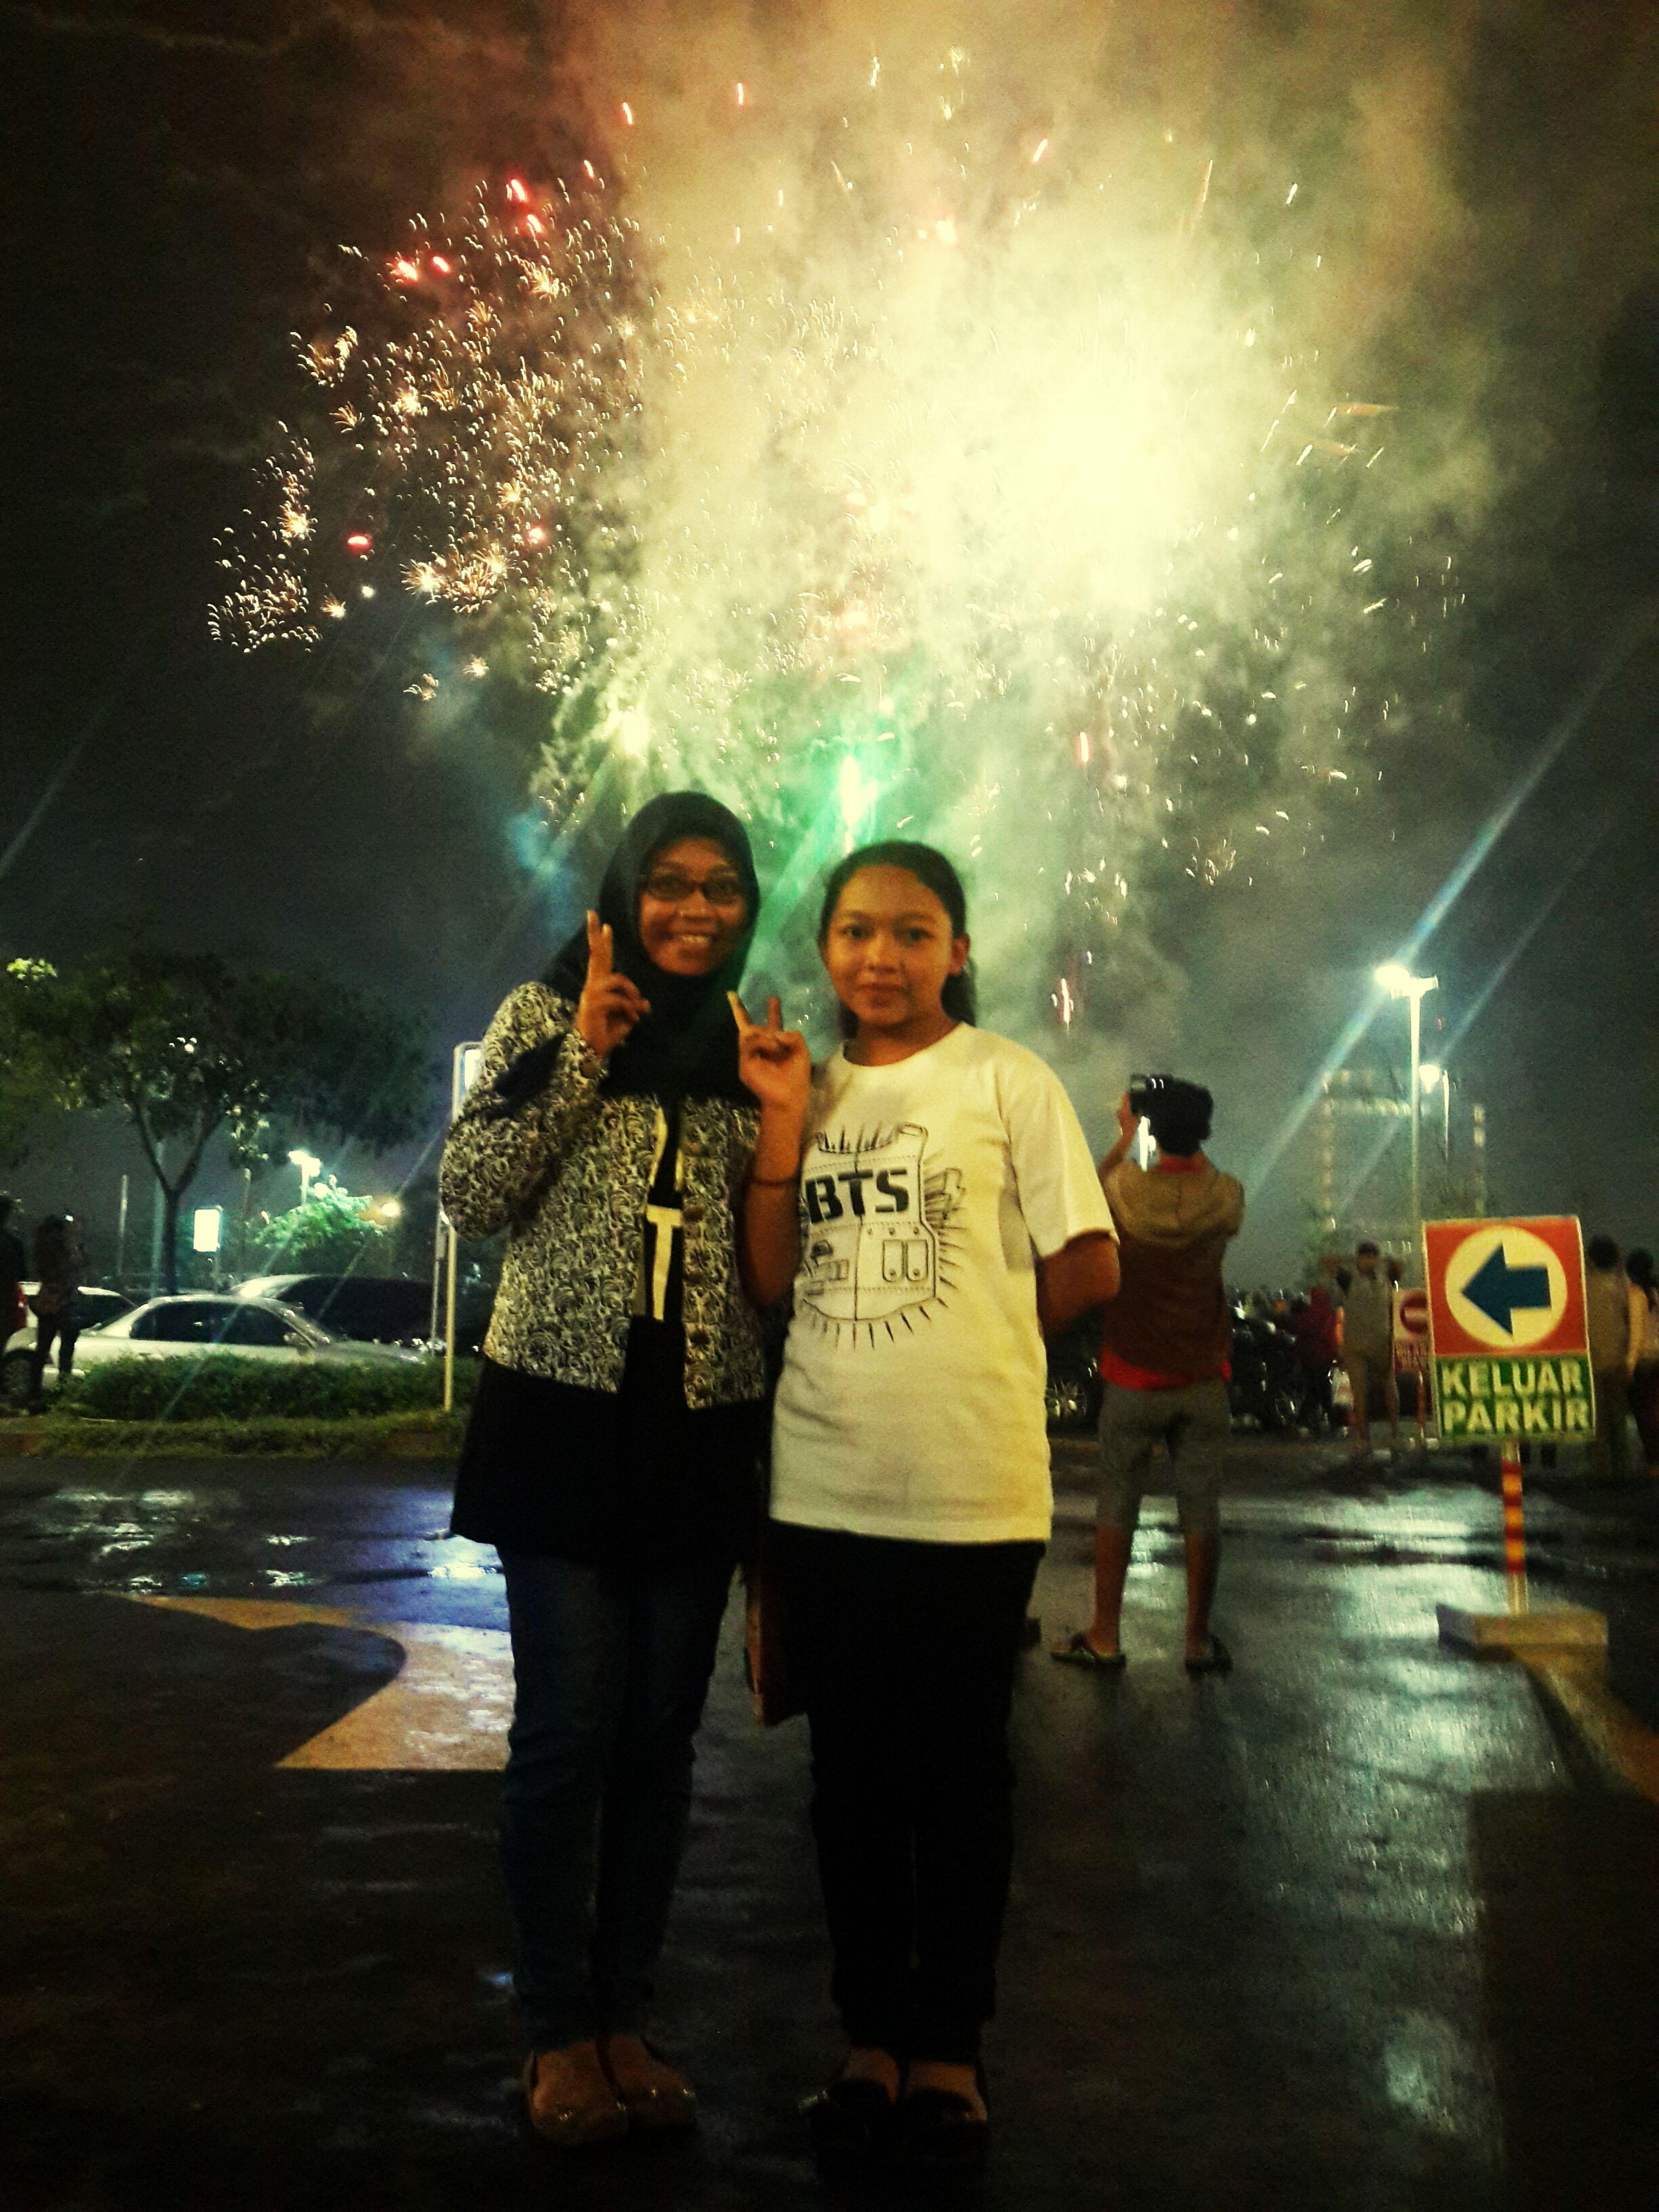 Happy New Year 2015 Happy New Year New Year's Eve Fireworks Happy New Year! Year End Party New Year 2015